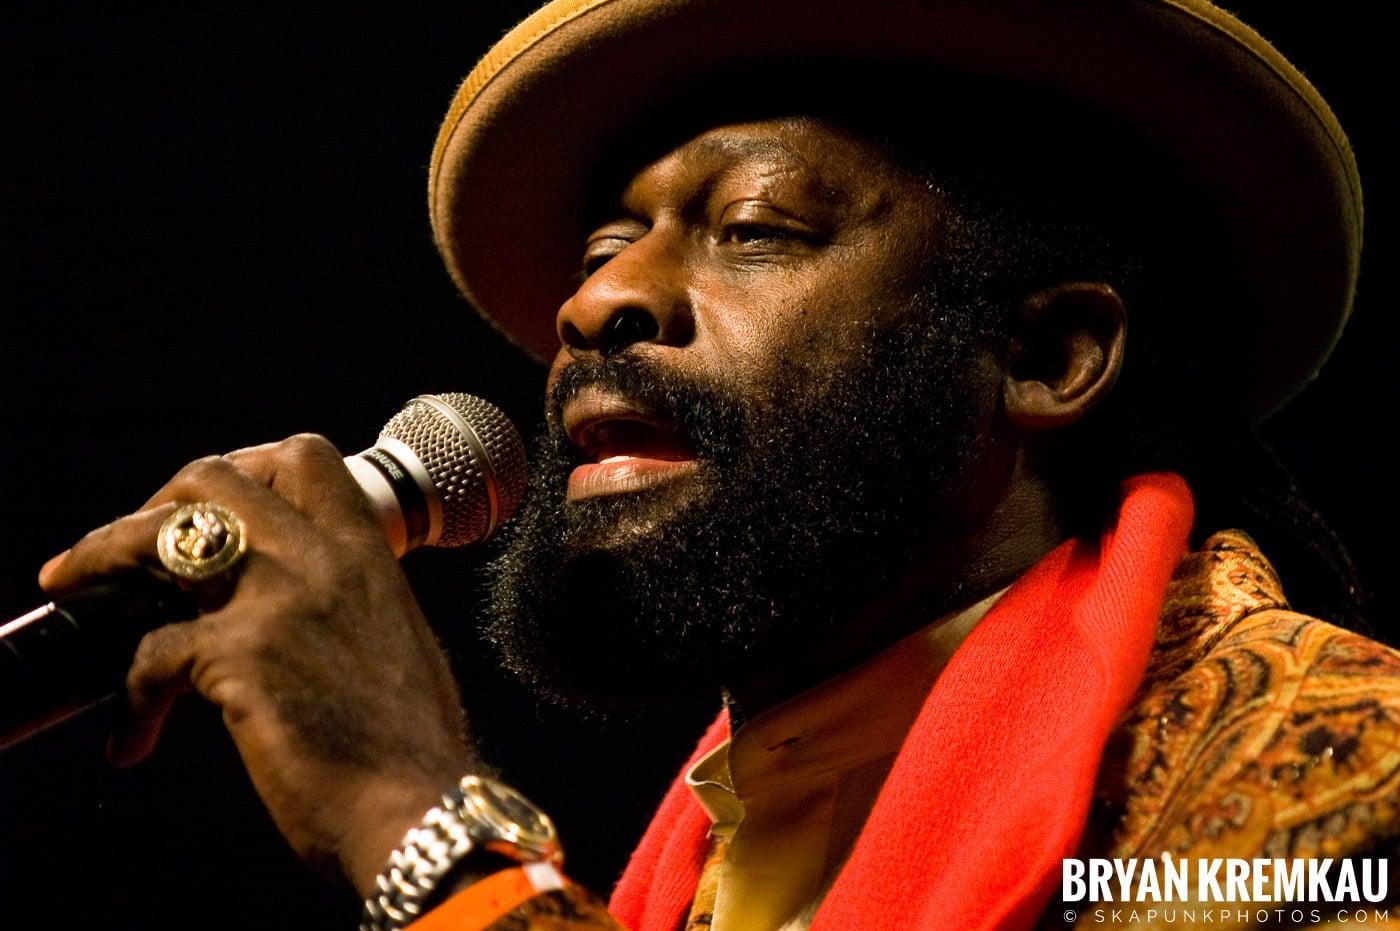 Jimmy Riley @ Vintage Reggae Fest - Hammerstein Ballroom, NYC - 12.16.07 (7)